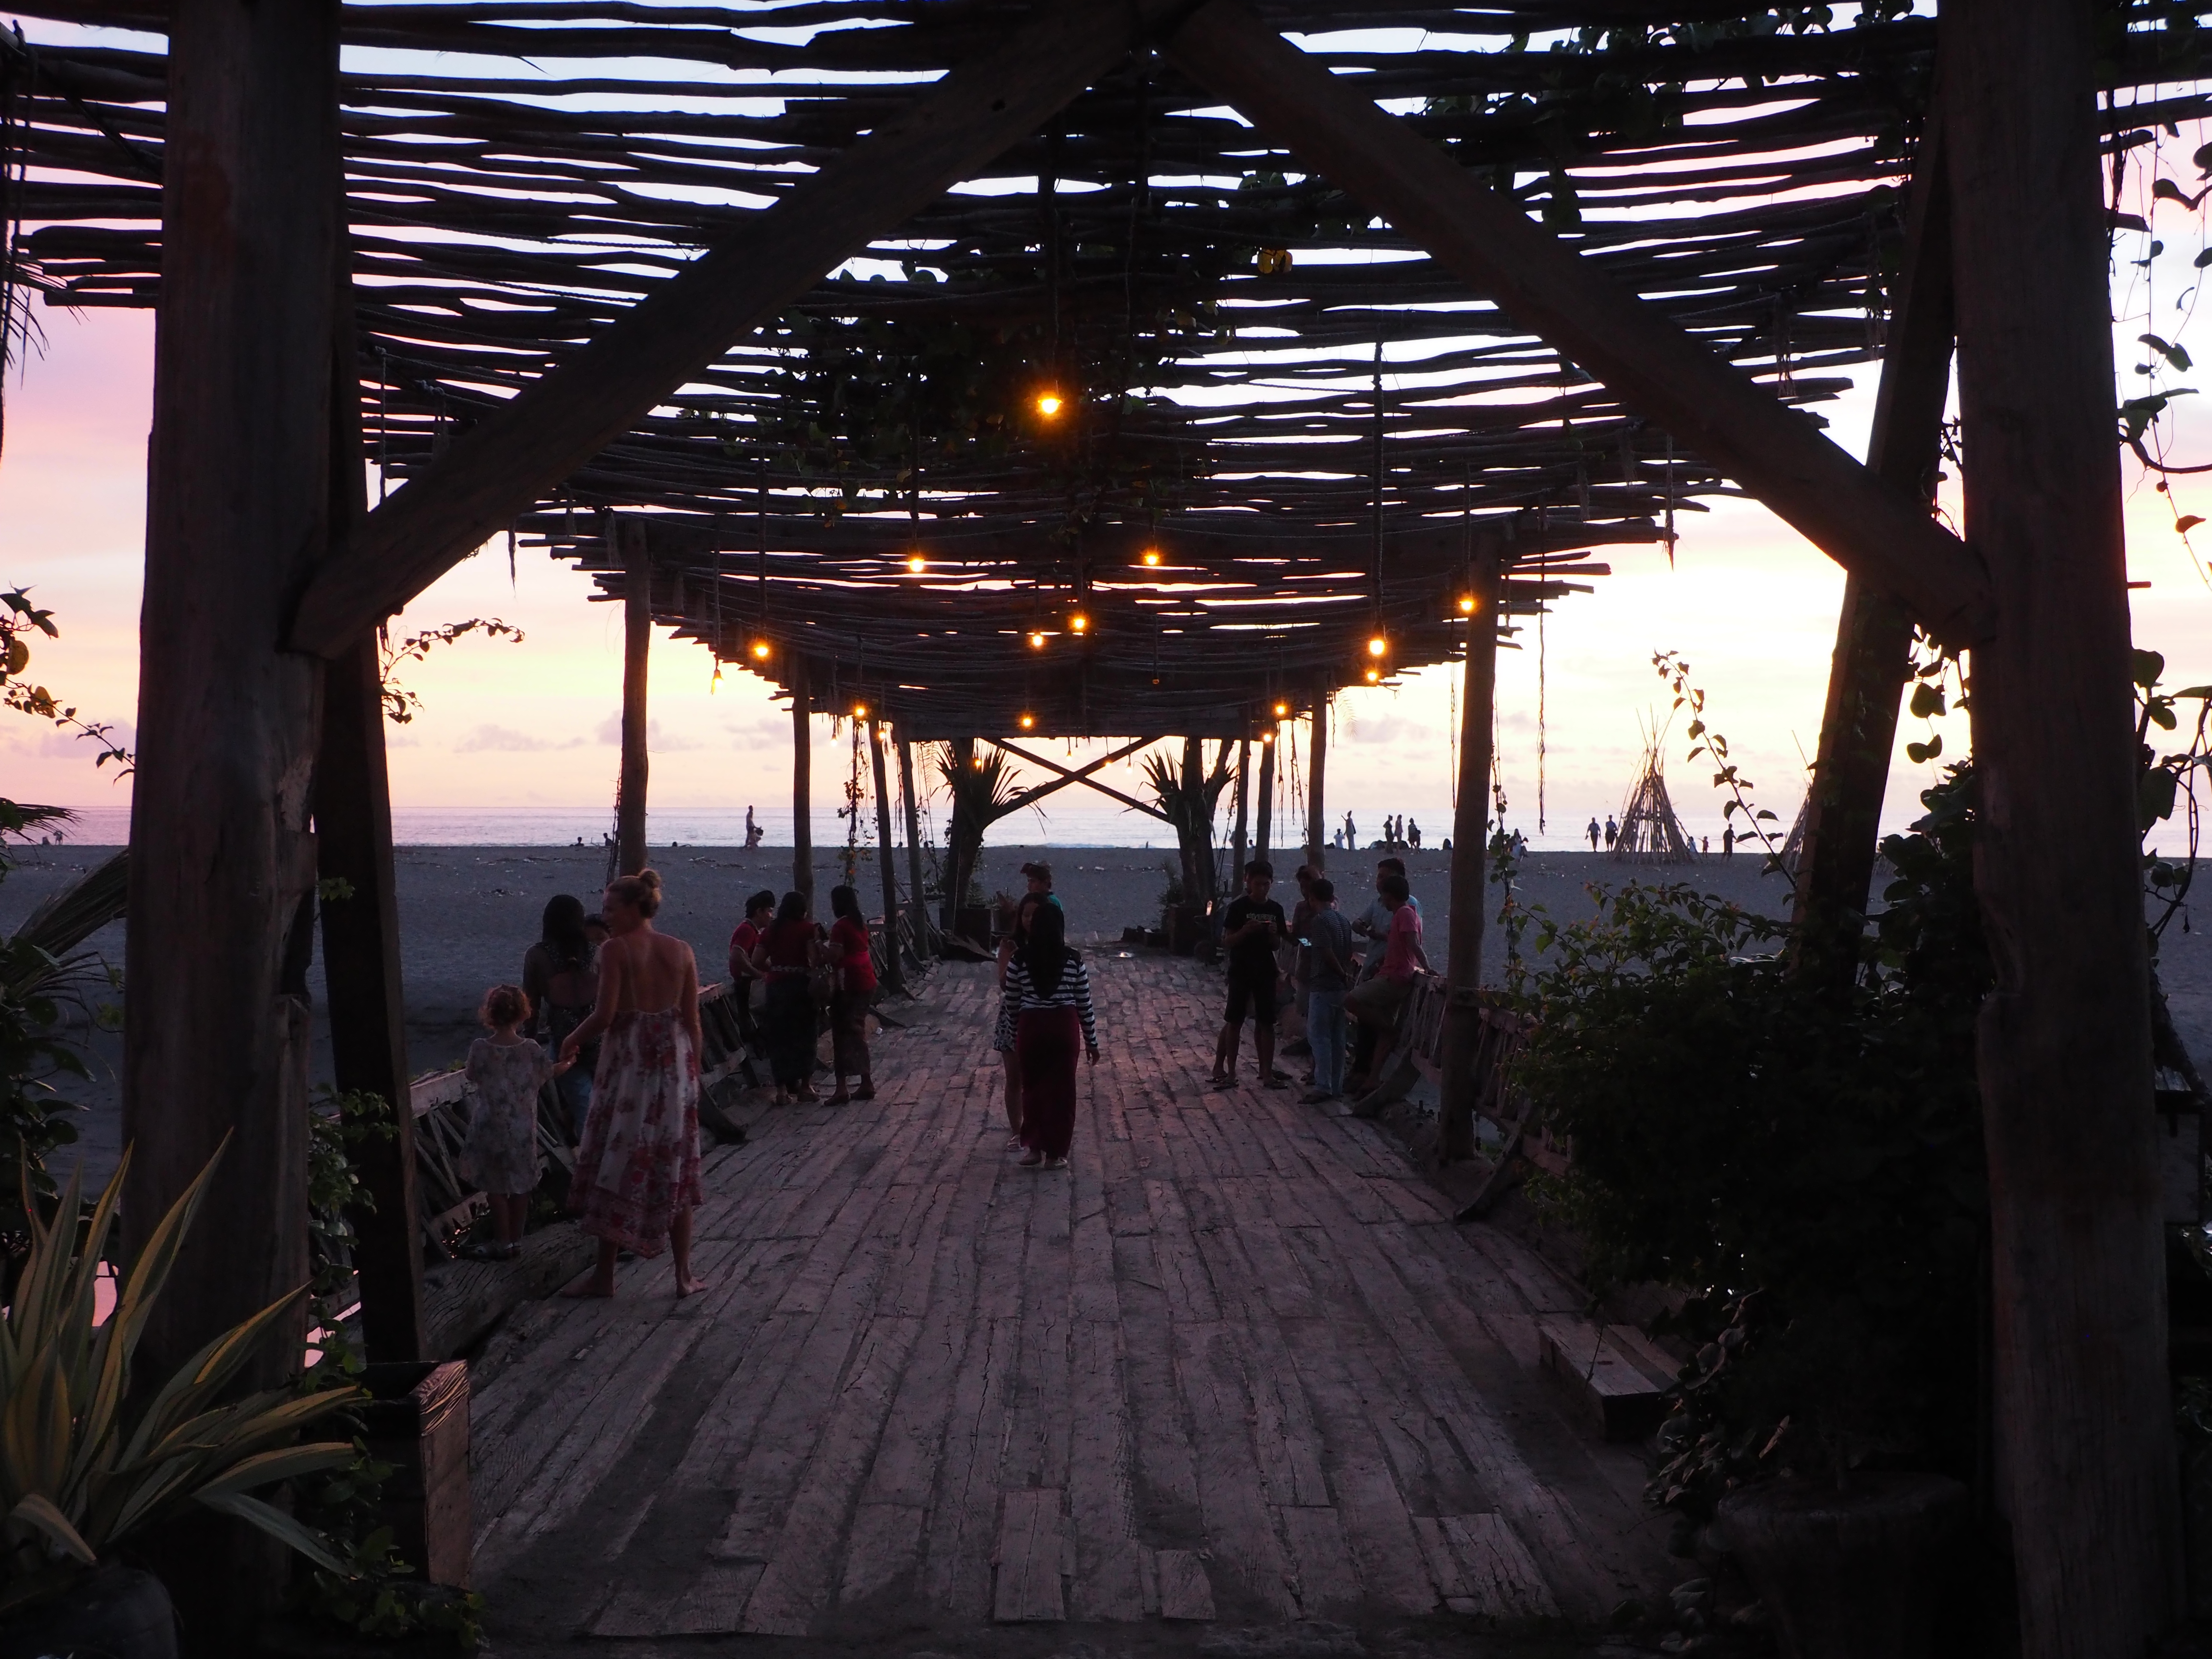 Beach Ocean Sunset Coastline 4